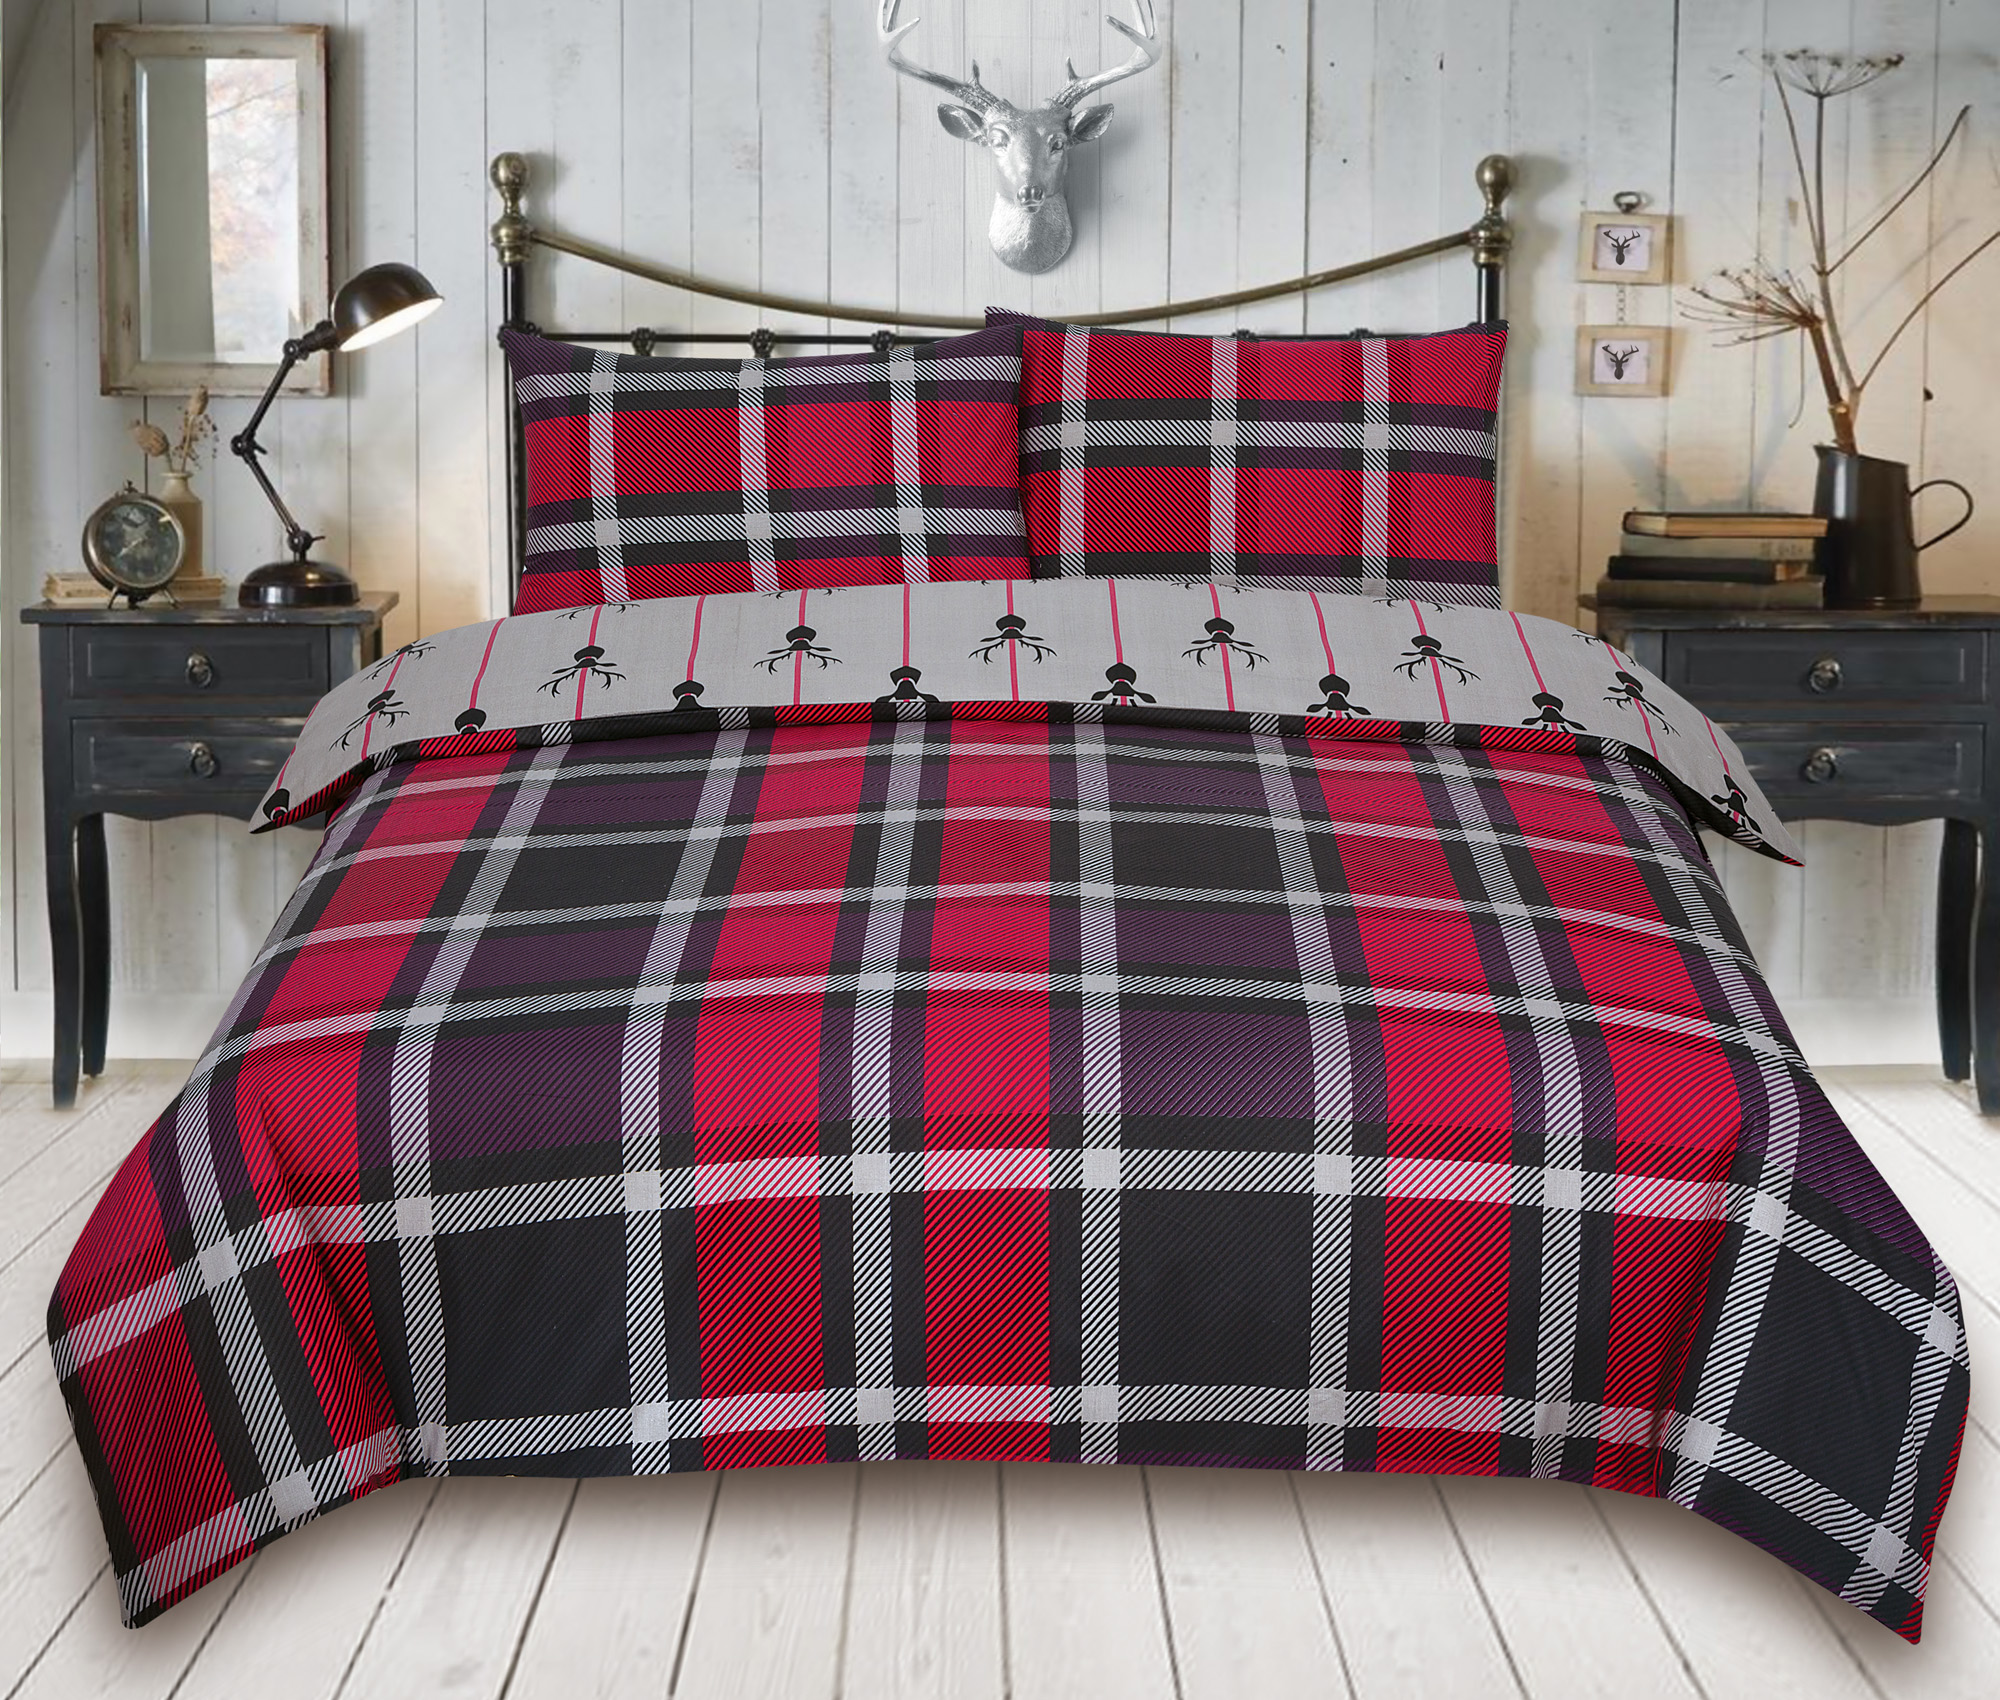 Check Stag Tartan Deer Antlers Bedding Single Double King Duvet ... : tartan quilt - Adamdwight.com